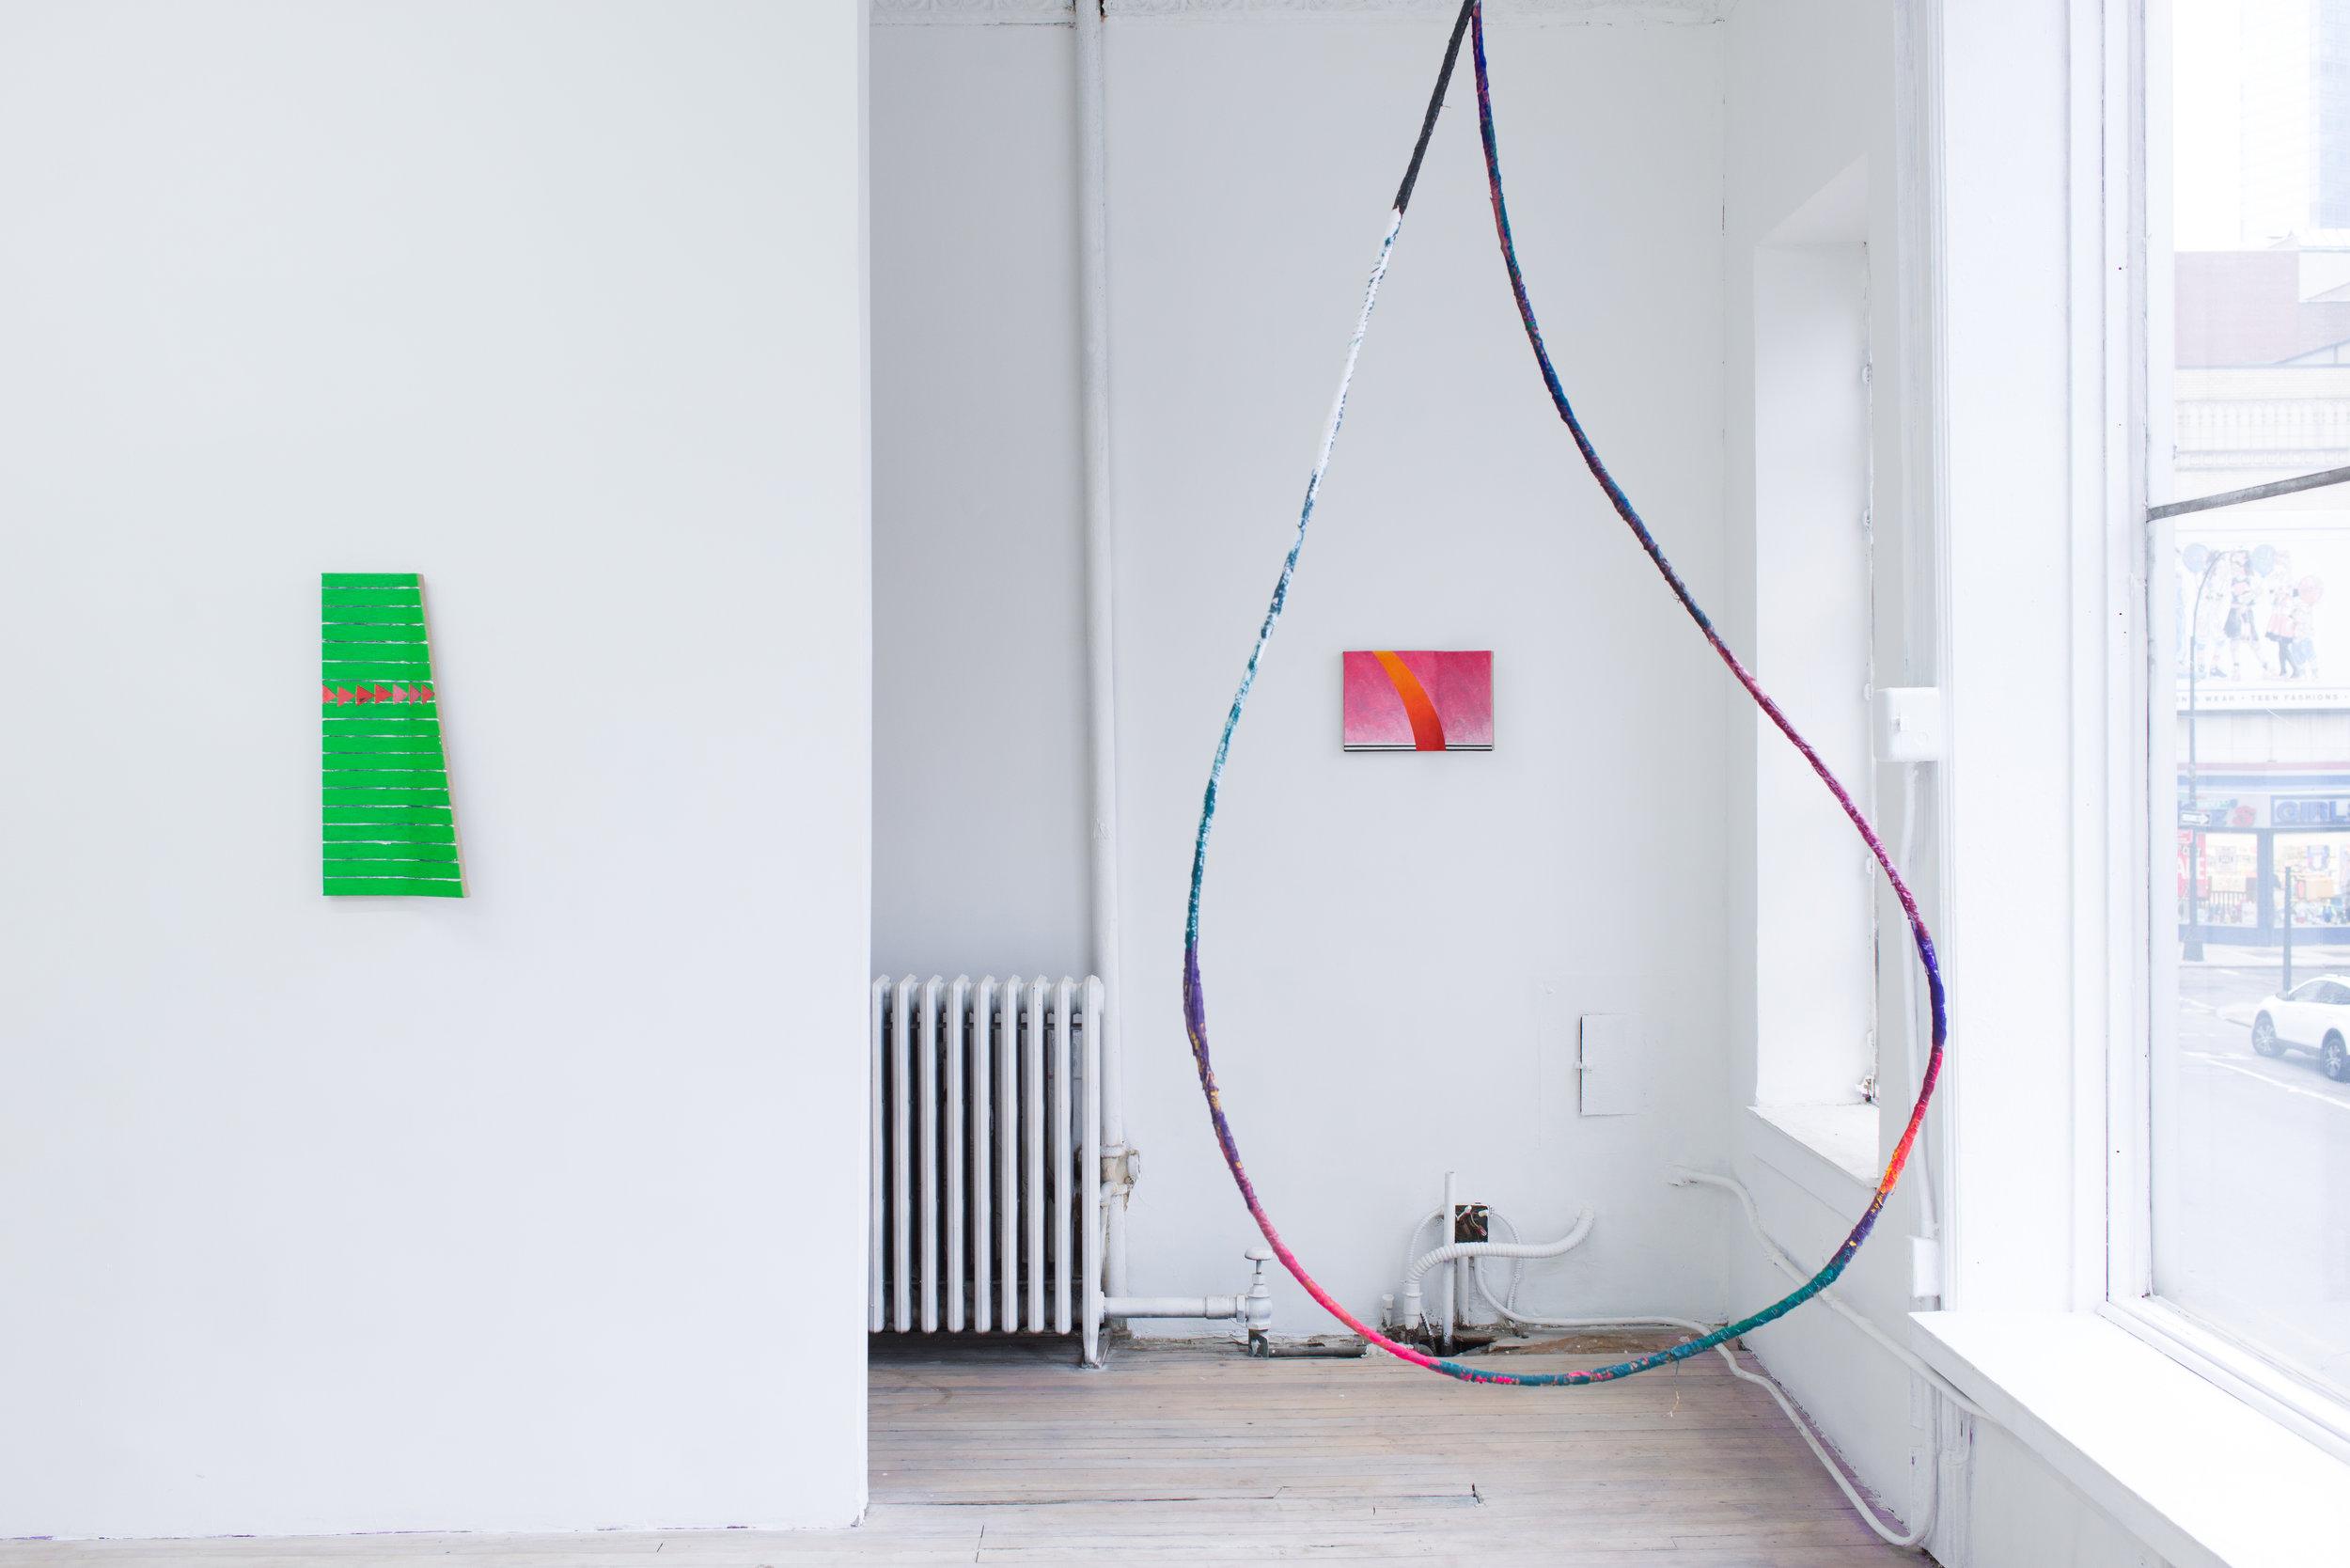 Fabienne Lasserre   Larmes 3 (outline),  2018 Steel, linen, acrylic polymer, enamel and acrylic paint 94 x 45.5 x 1.25 inches